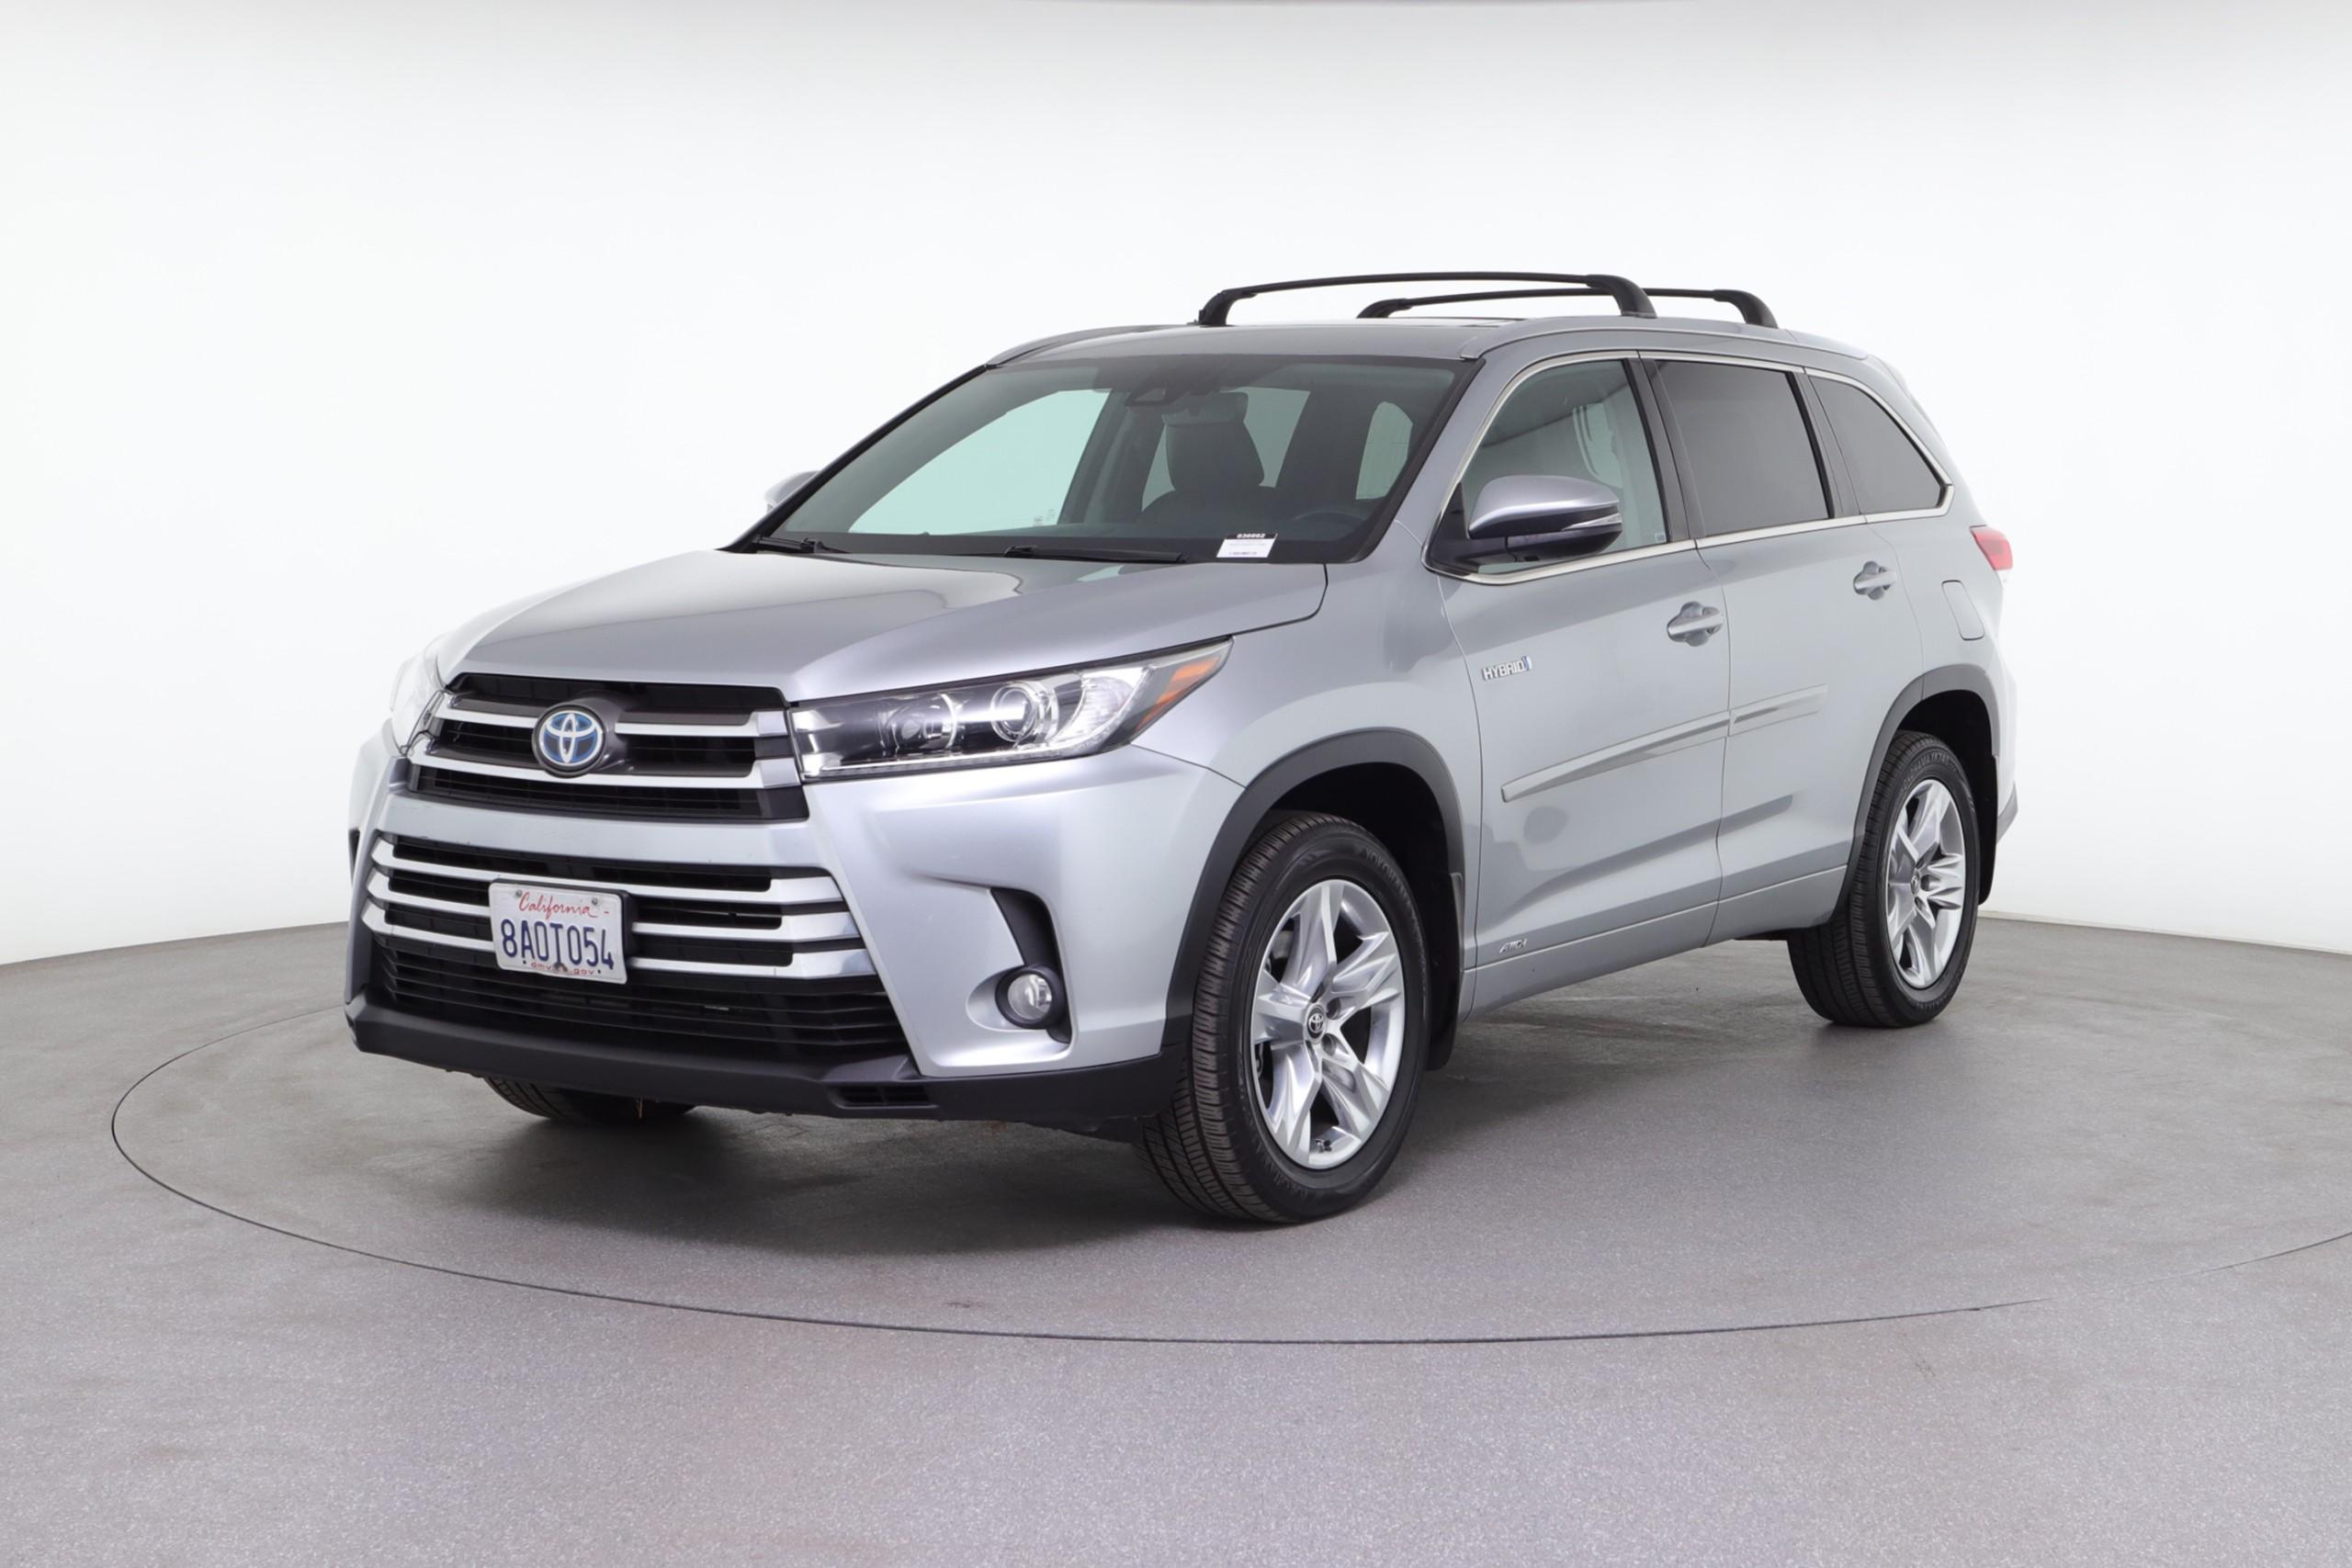 2017 Toyota Highlander Hybrid Limited (from $33,950)